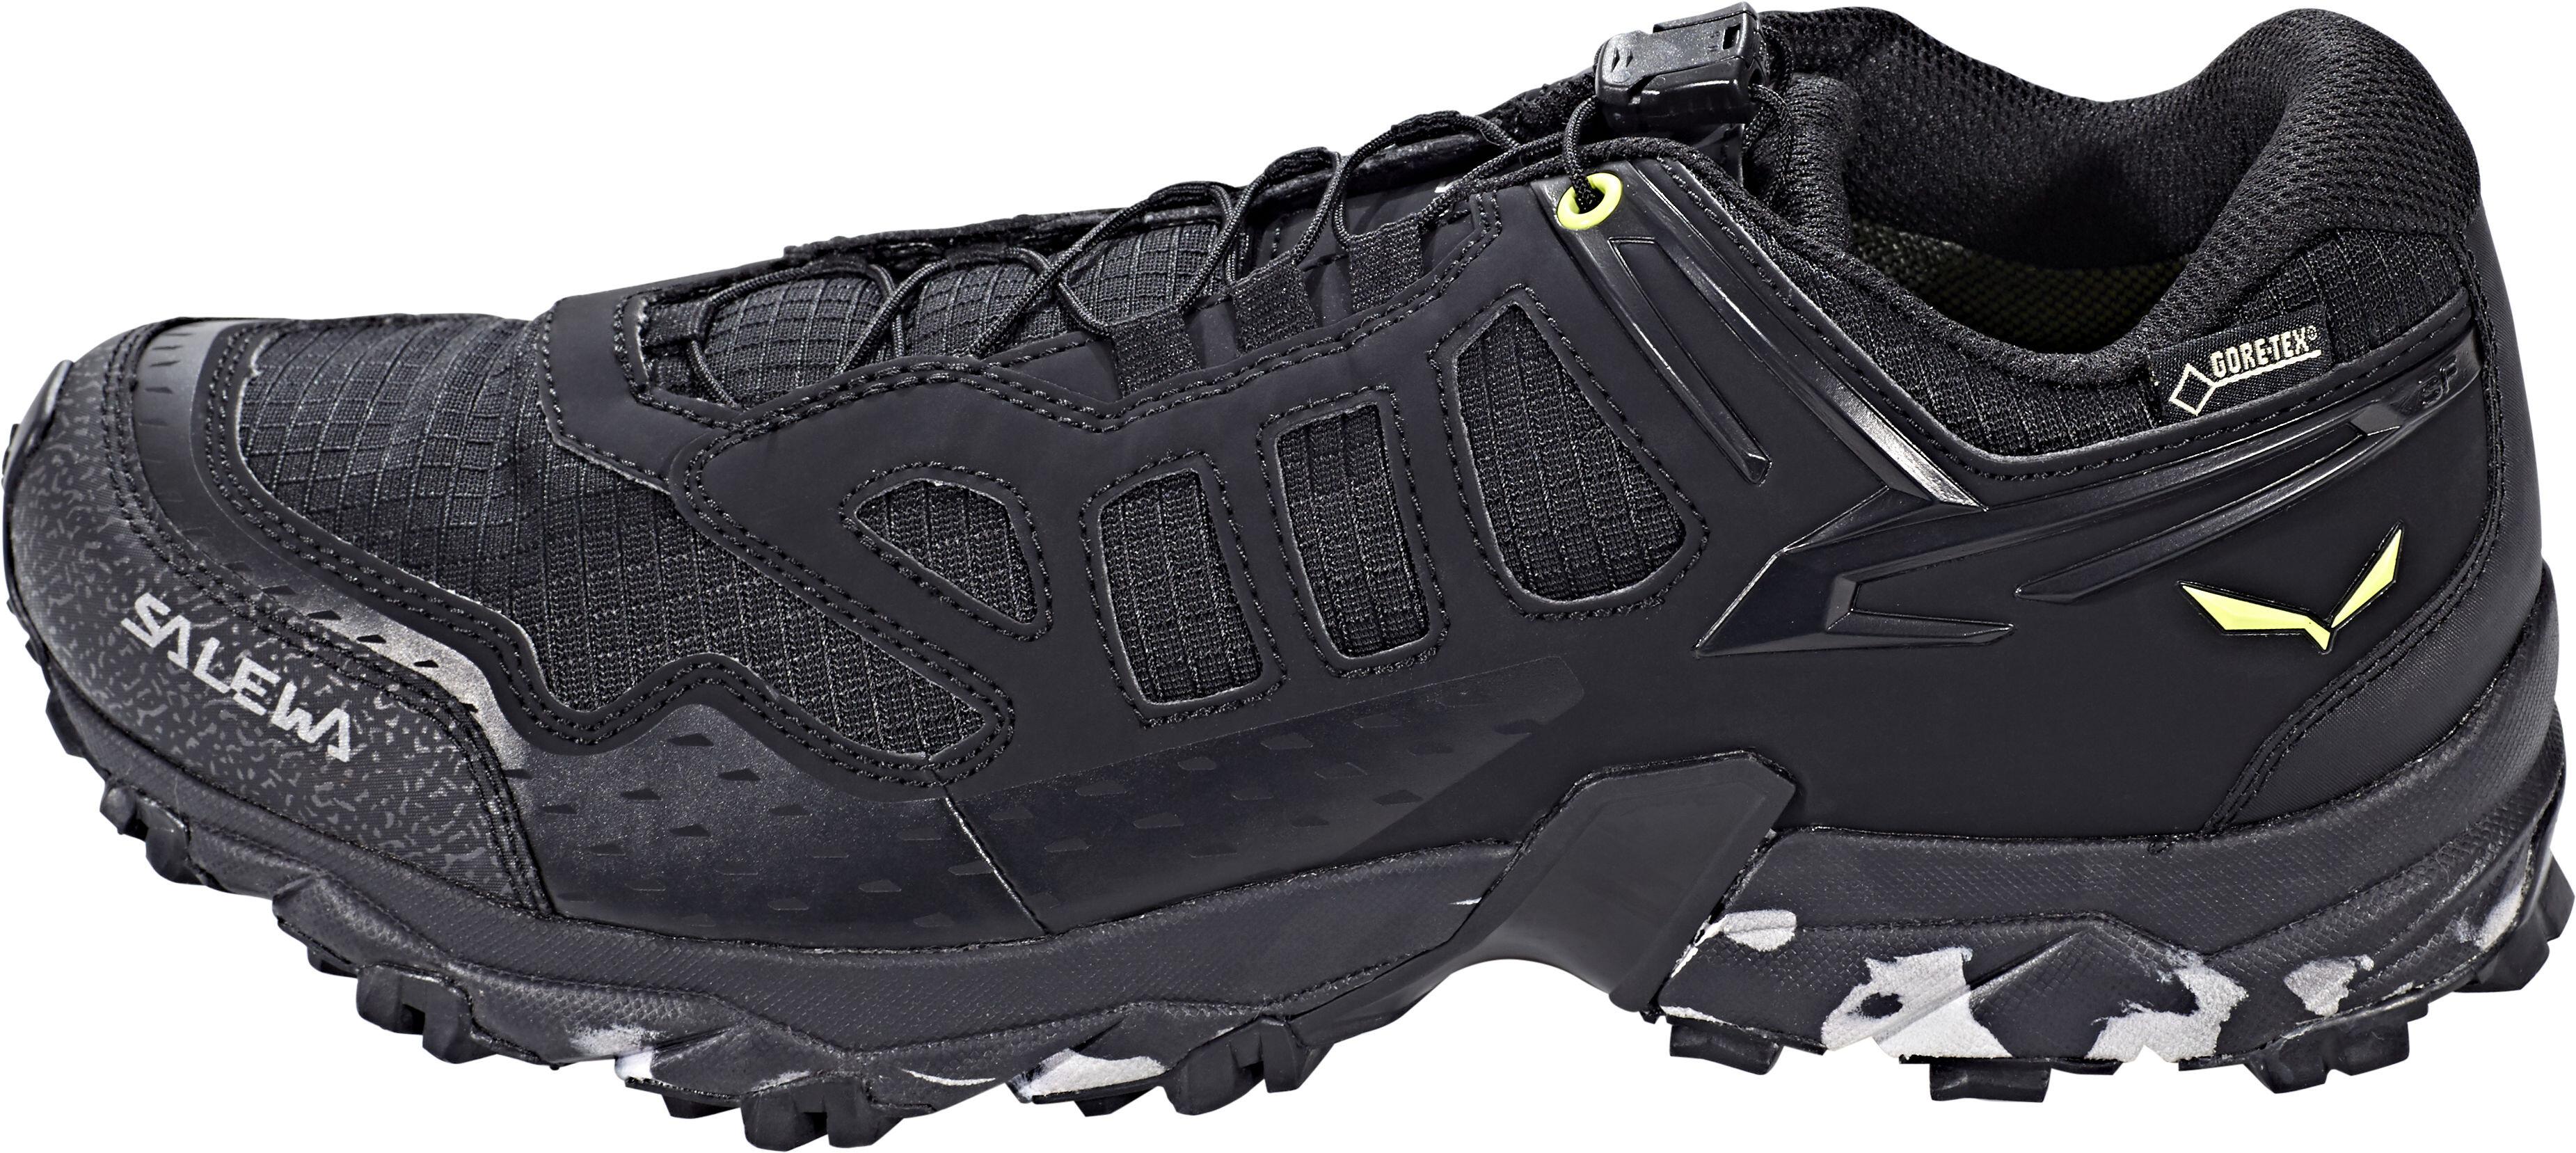 Salewa Ultra Train GTX Shoes Men Black Swing Green  63605948726